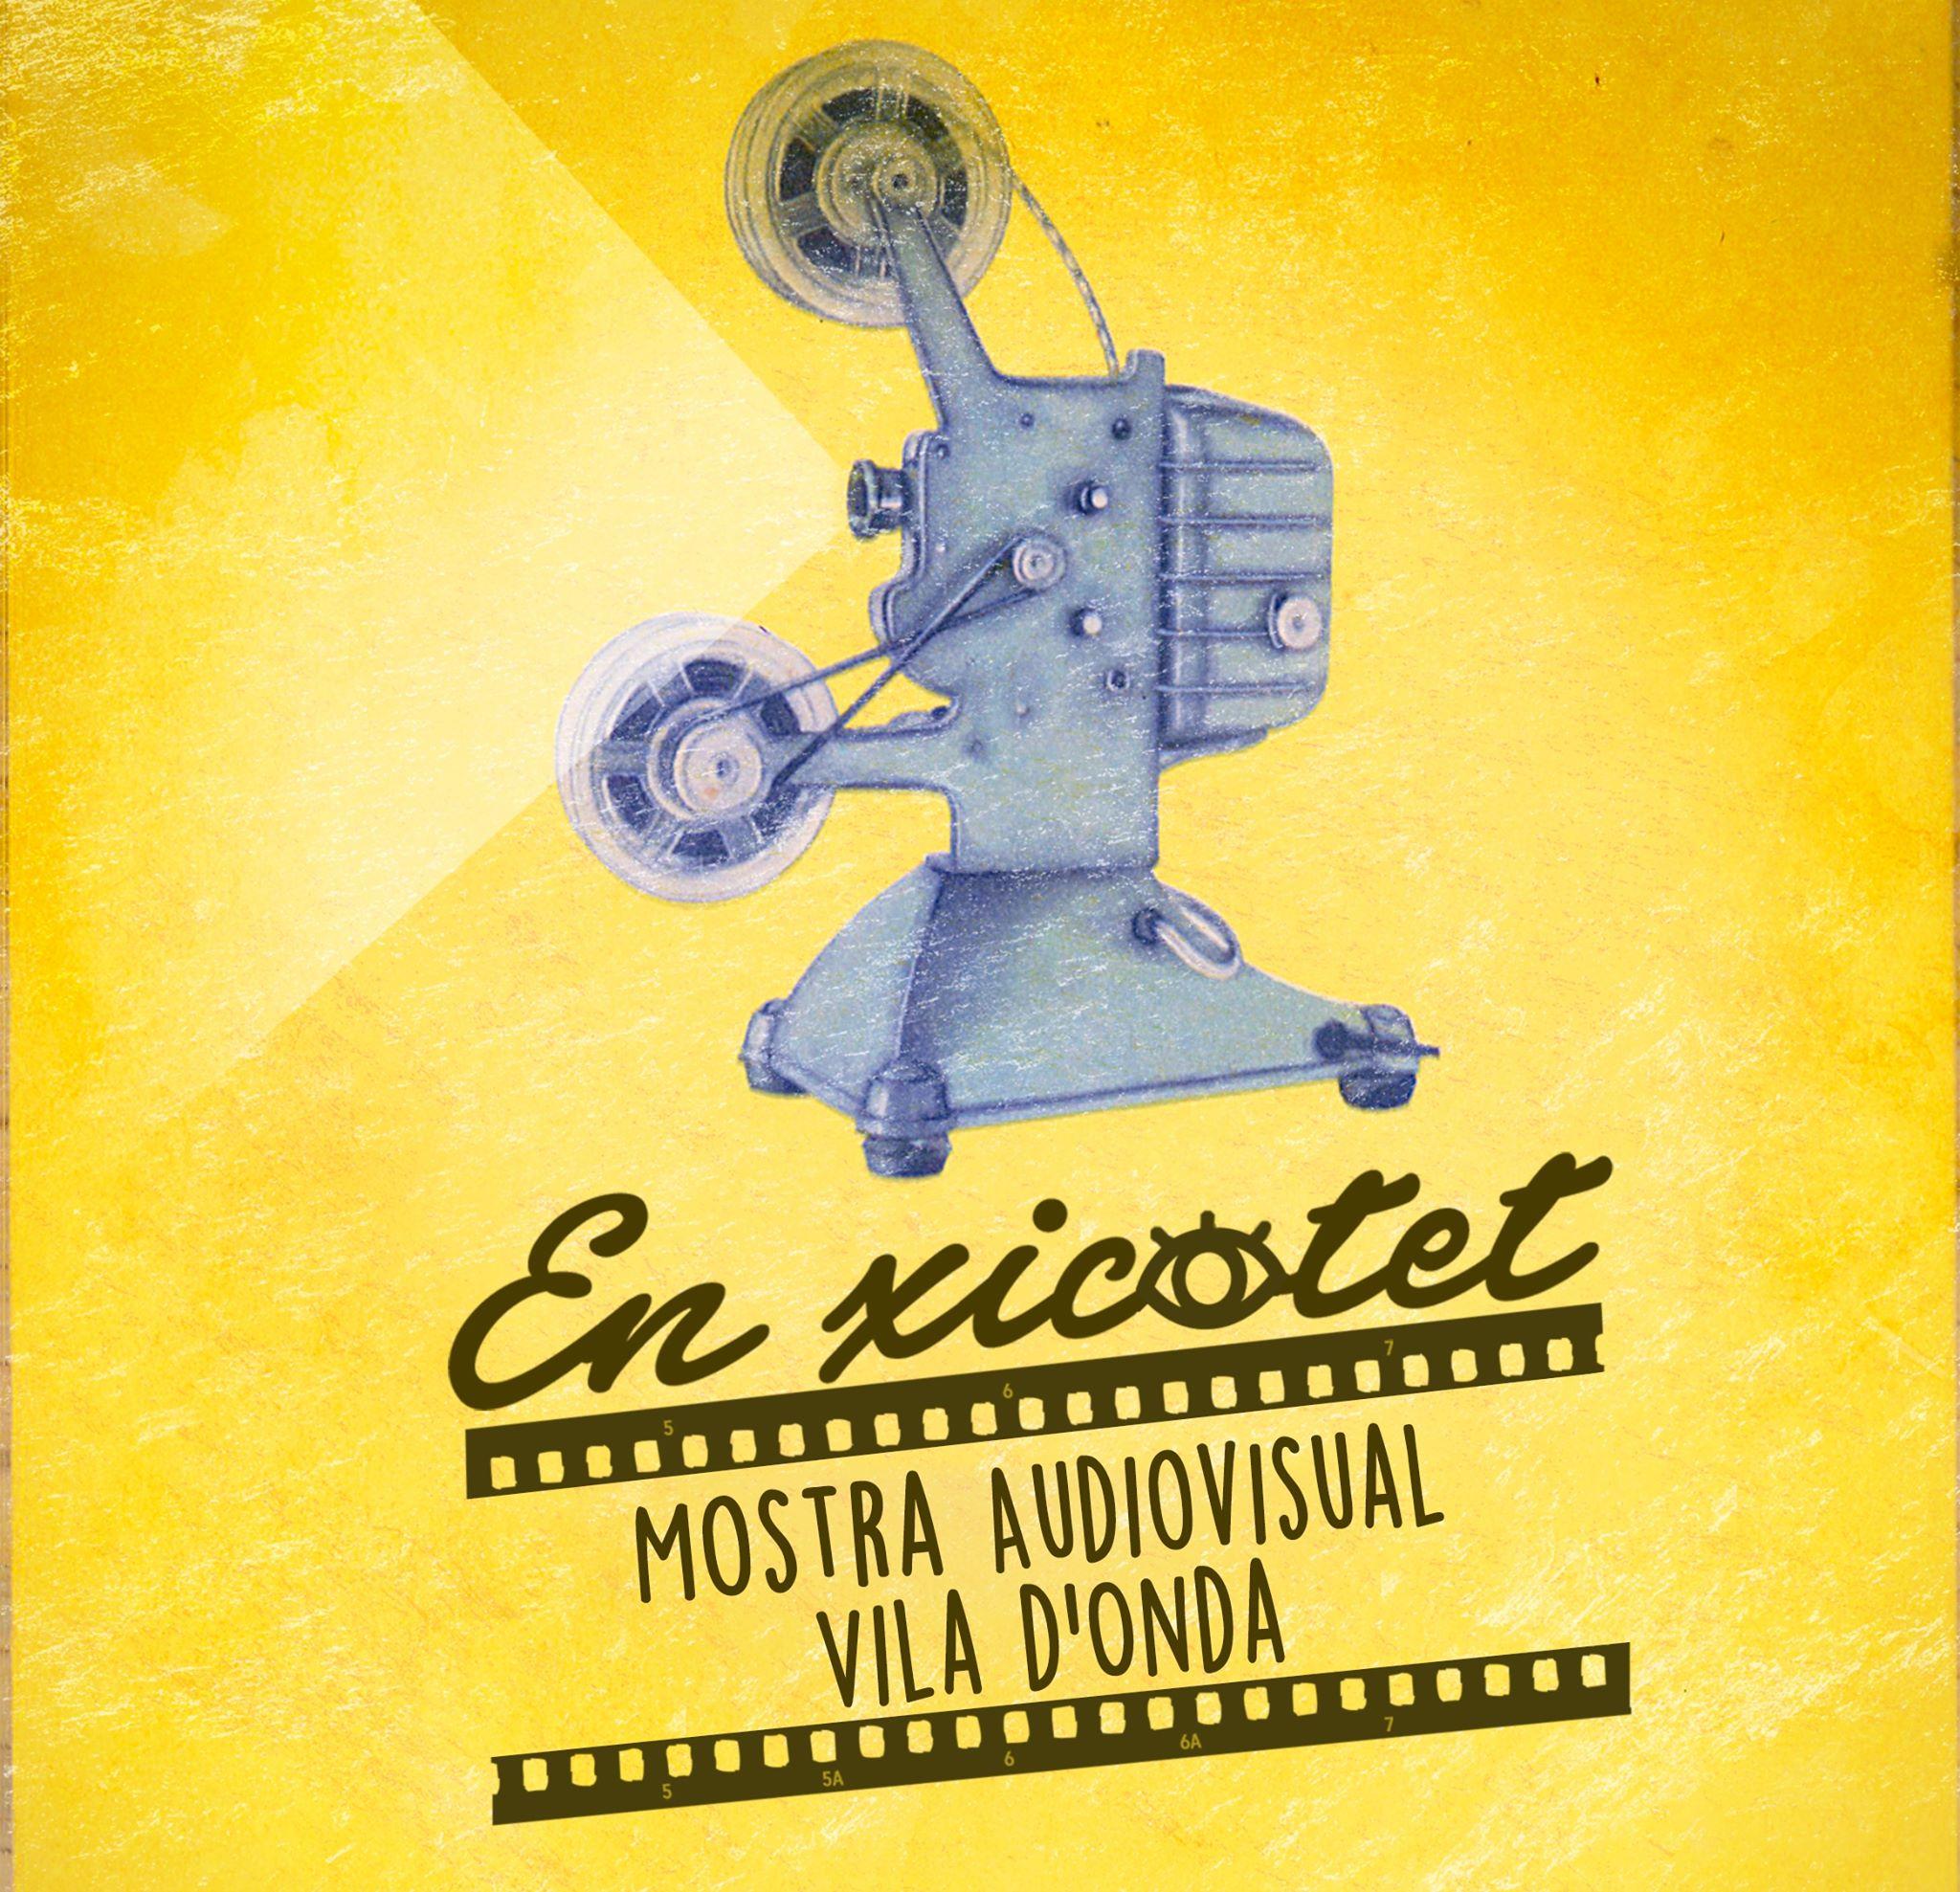 La 'Mostra Audiovisual Vila d'Onda EN XICOTET' presenta los cortometrajes seleccionados